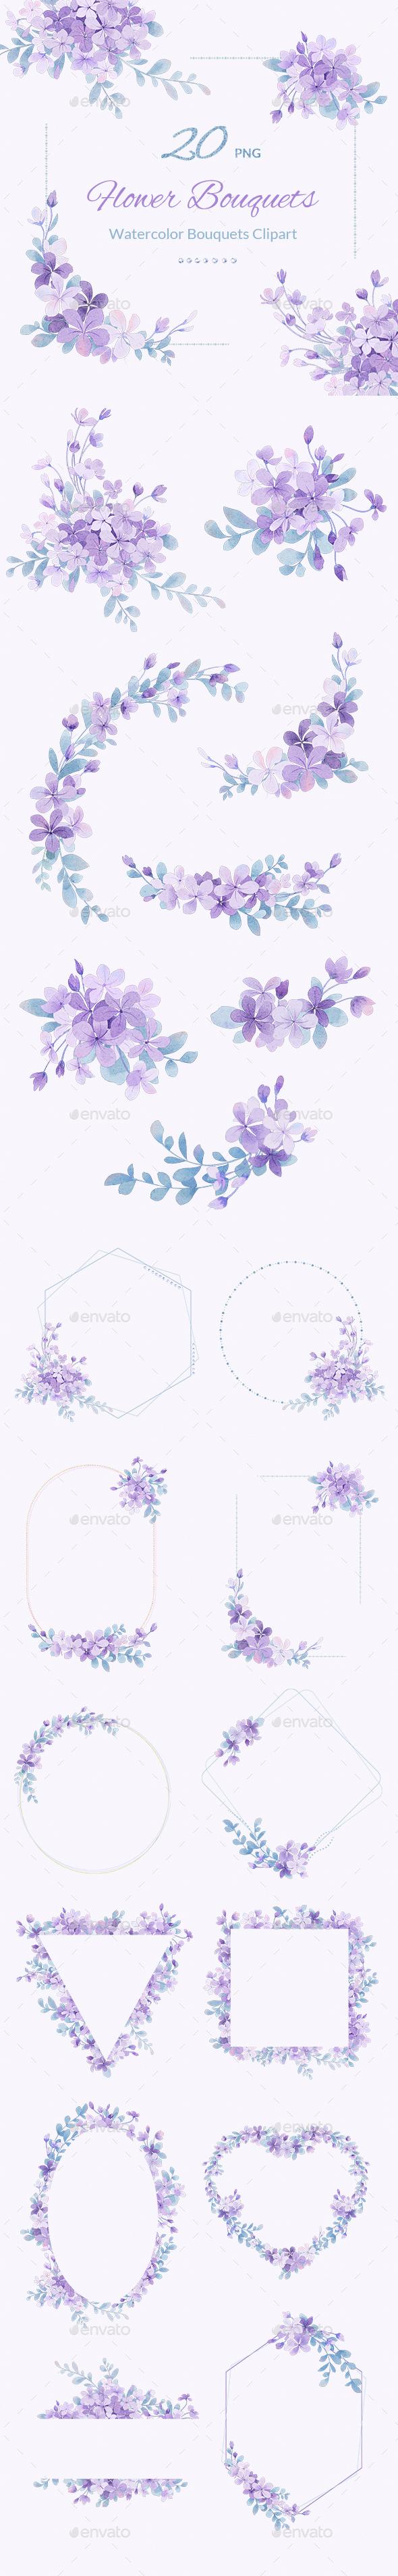 Purple Watercolor Floral Design Pack